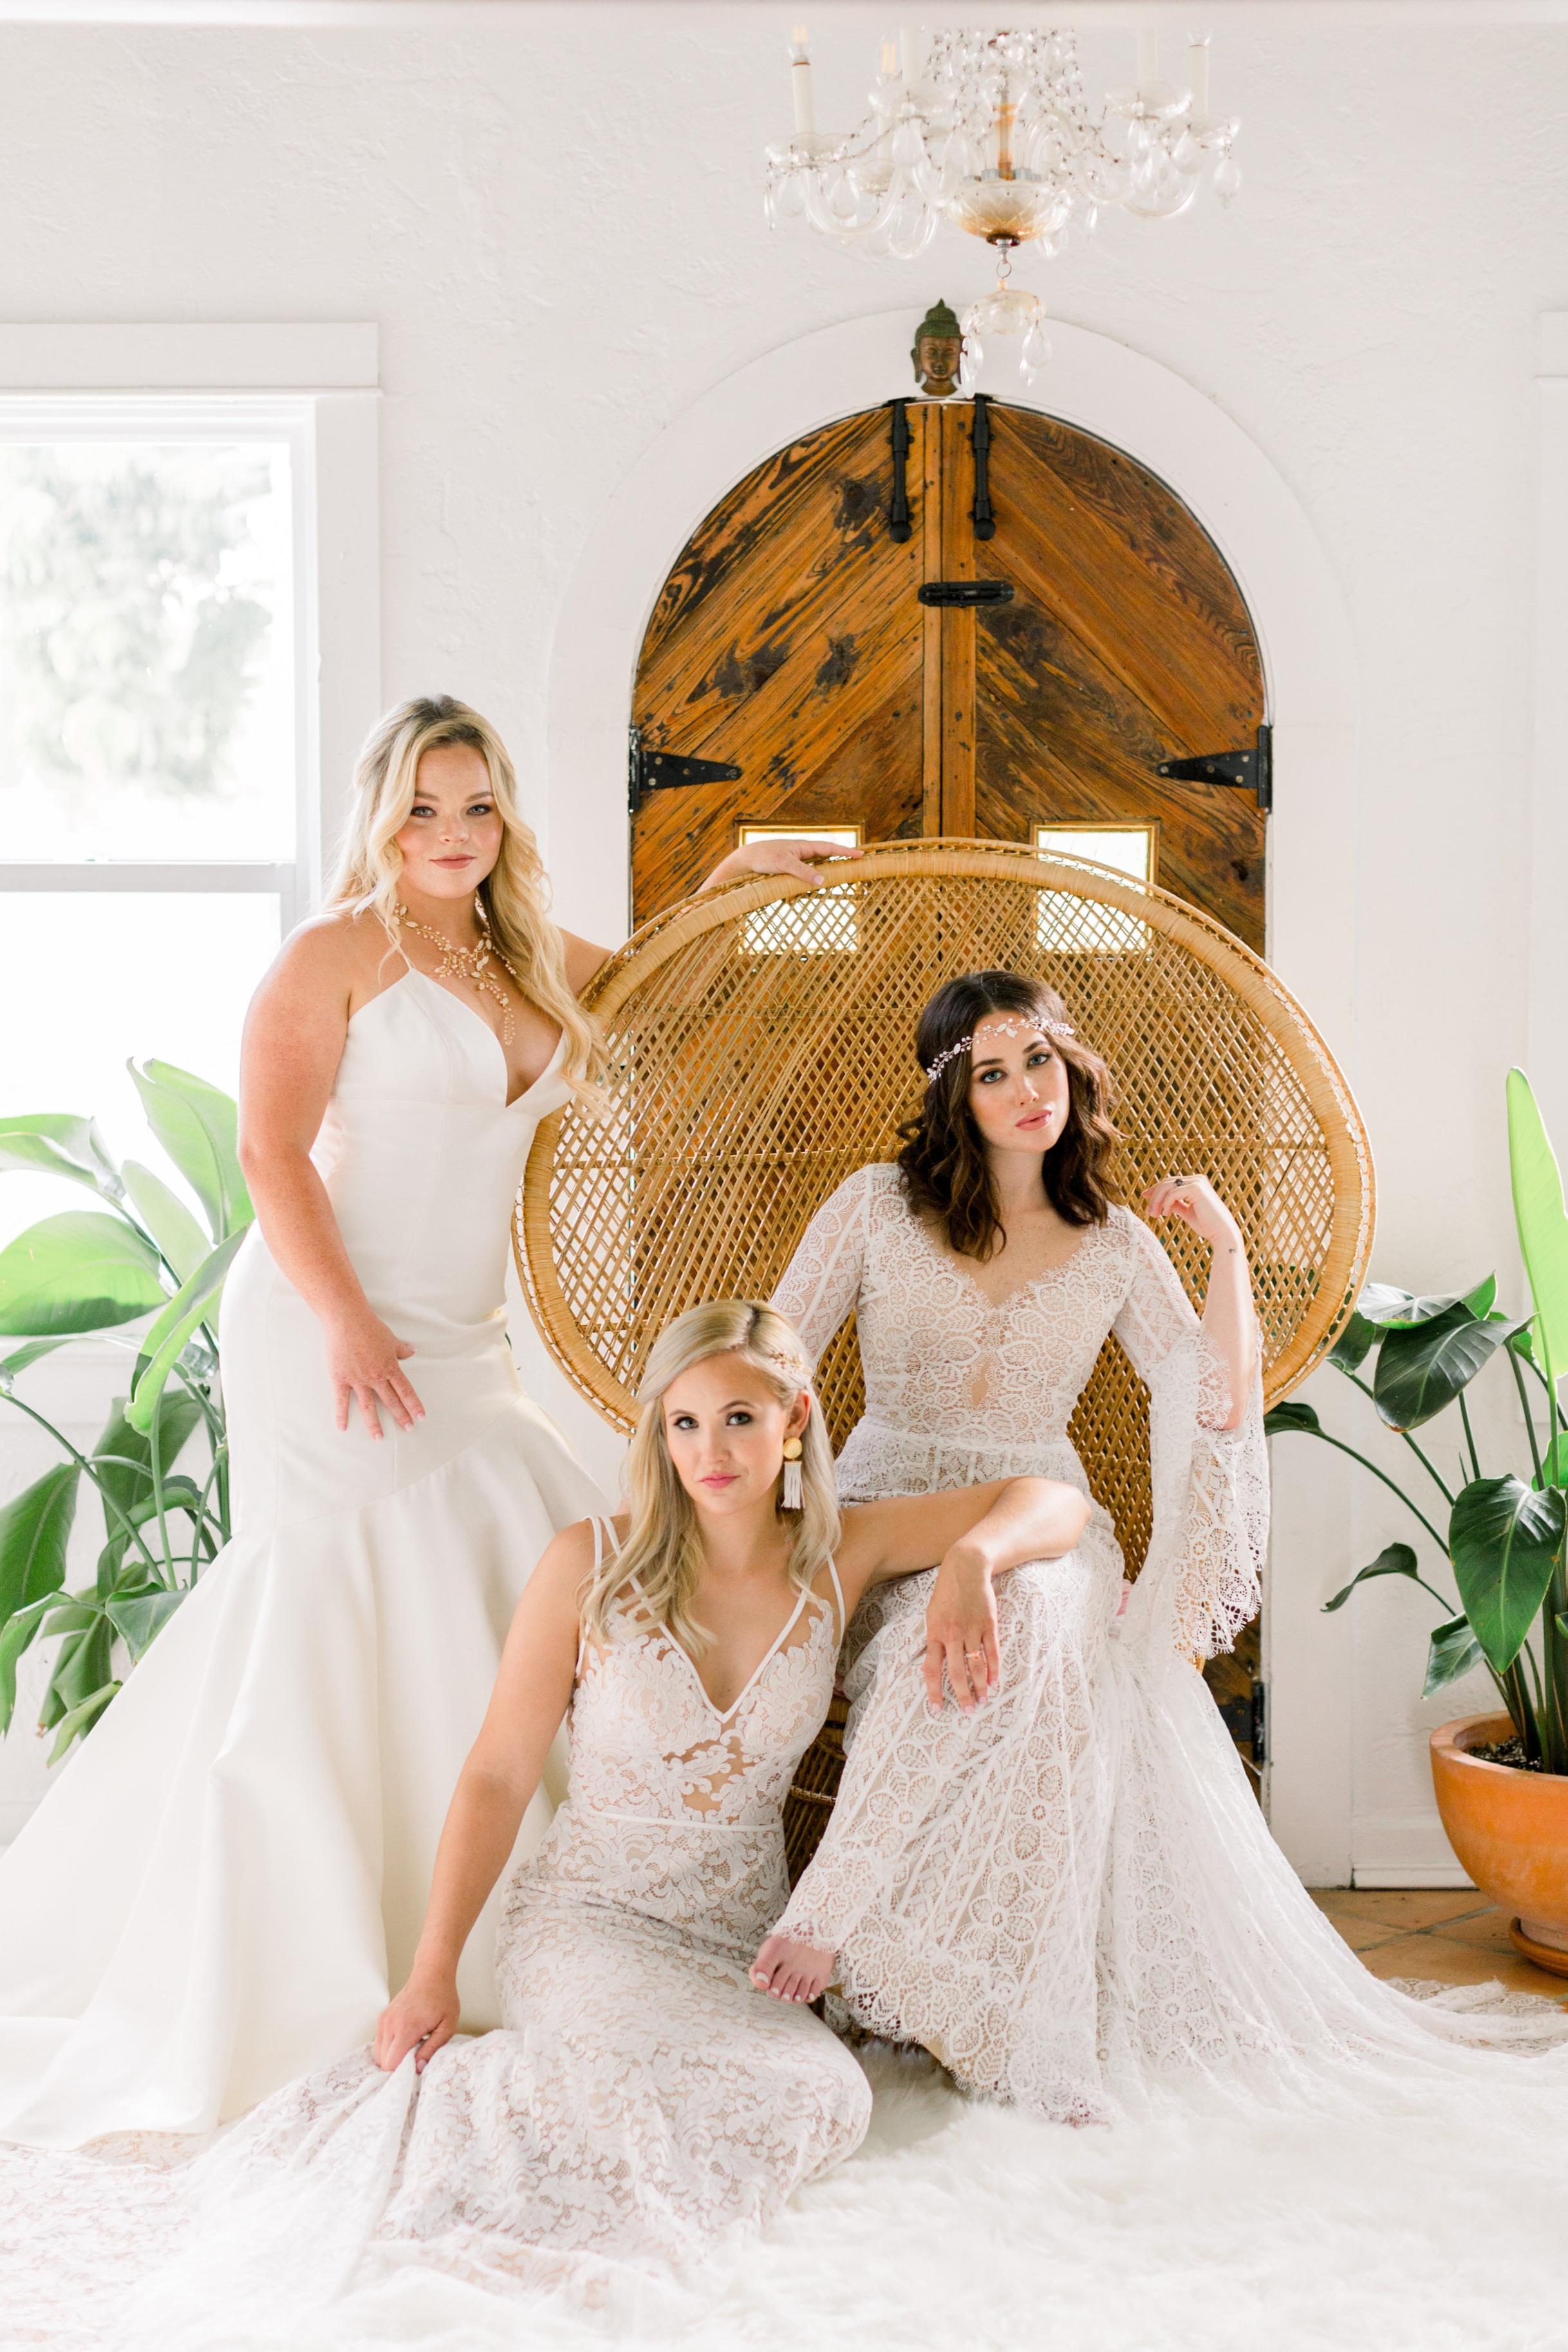 Boho+bride%2C+Boho+bridal+Accessories%2C+Boho+bridal+Earrings+Boho+Wedding%2C+Champagne+and+GRIT+relentless+Dreamer.jpg